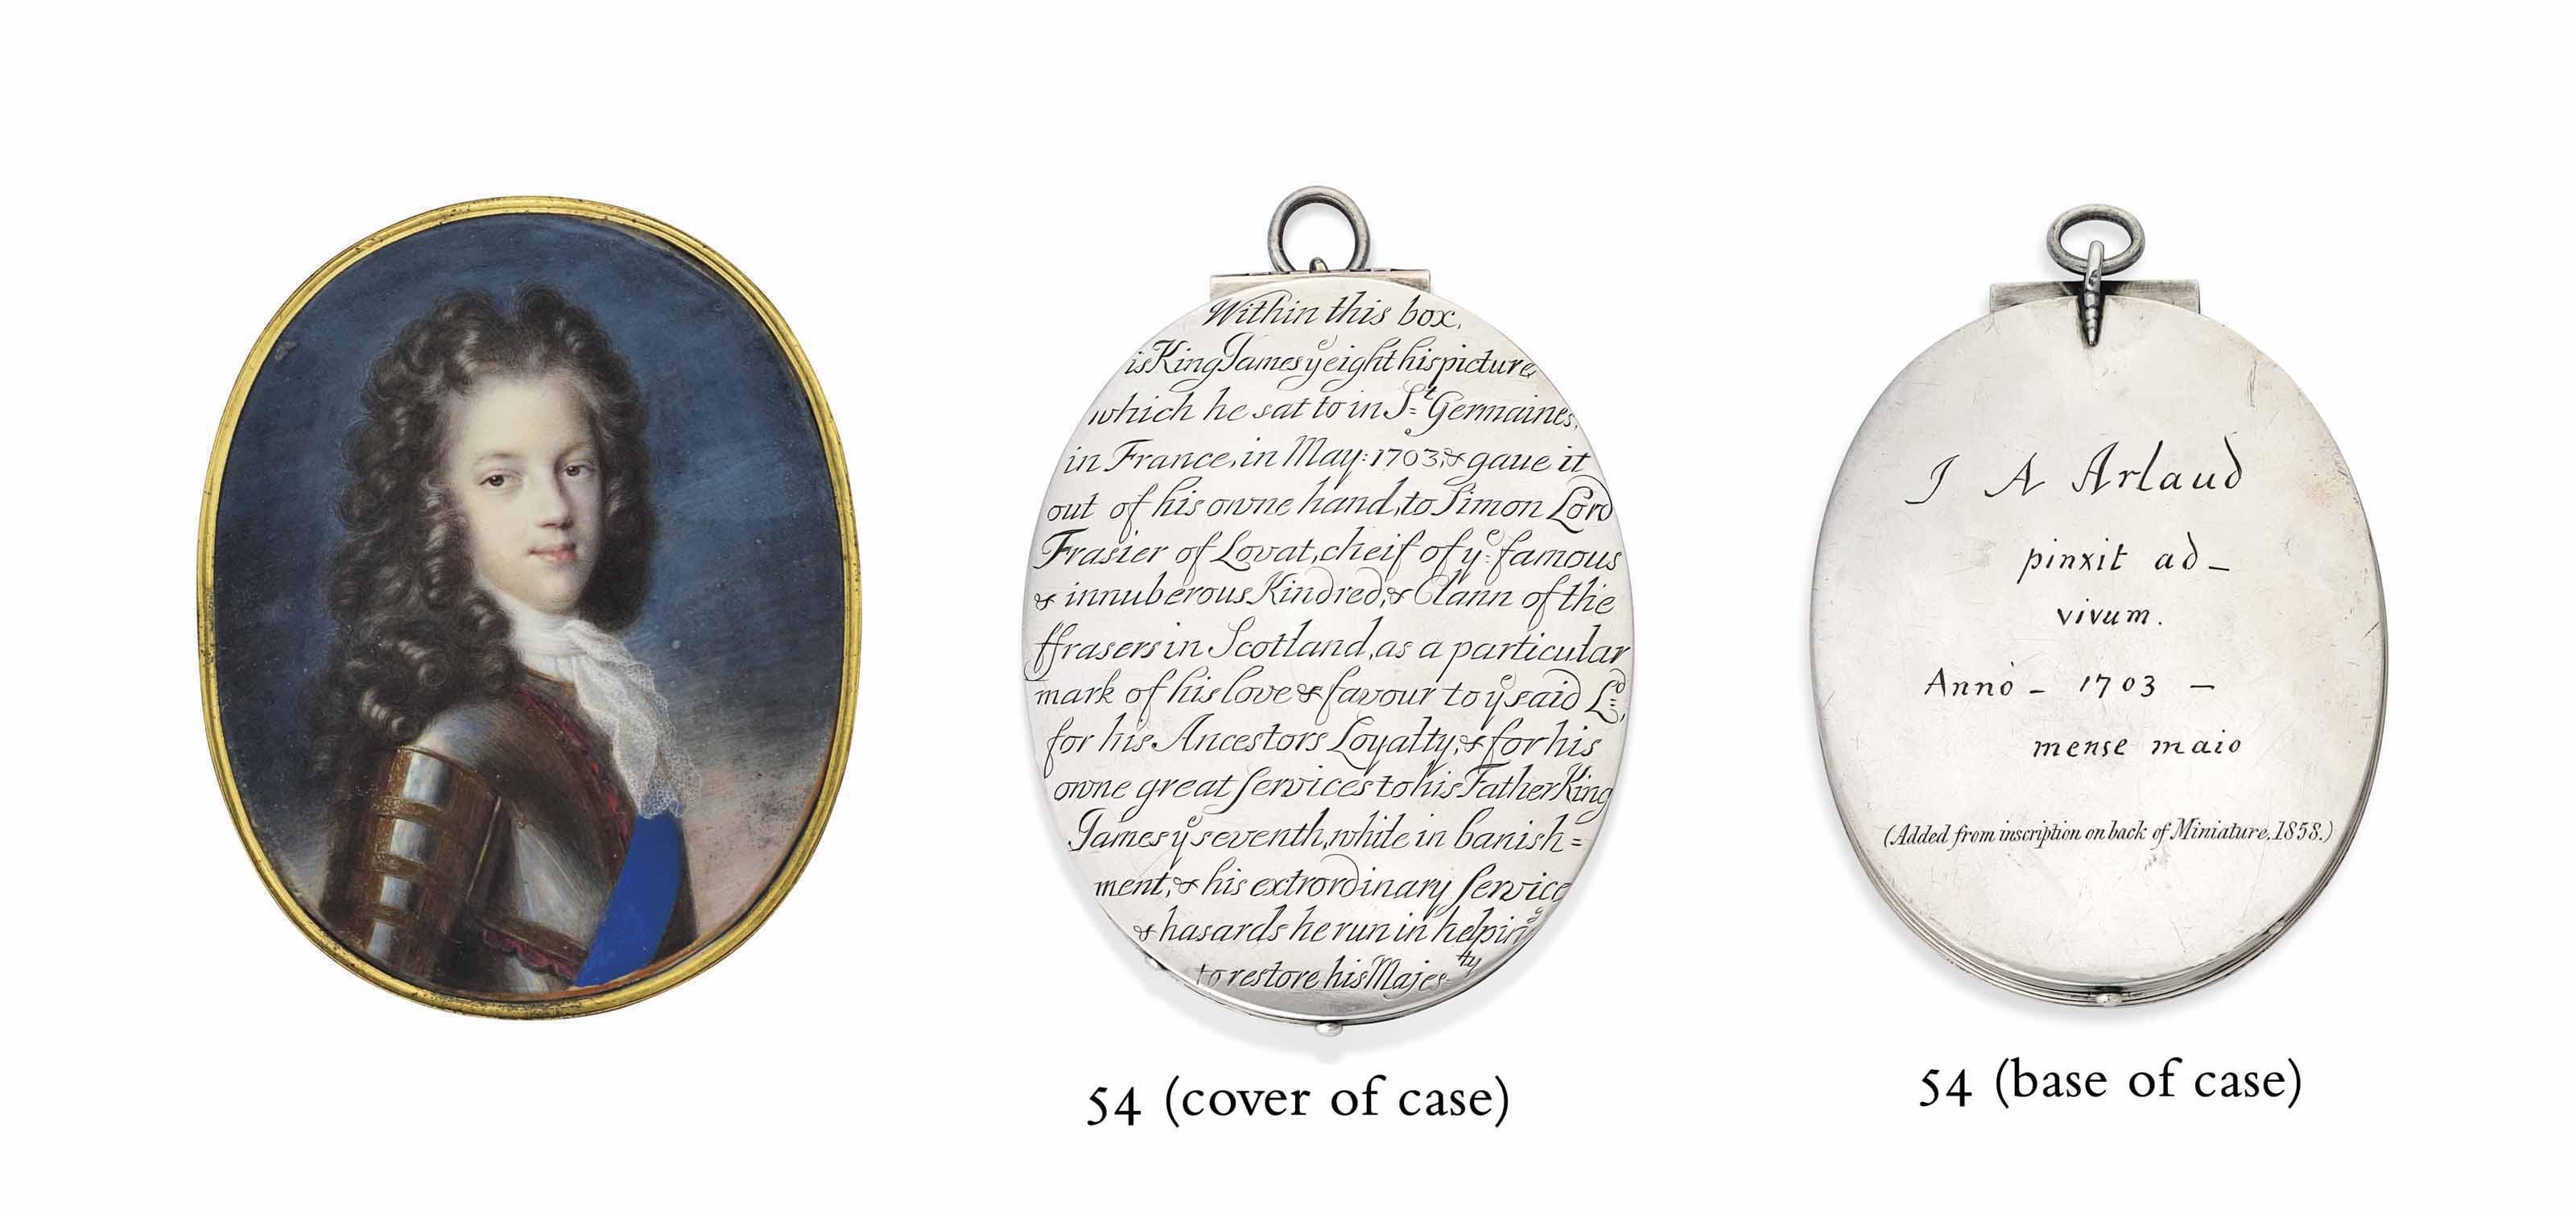 JACQUES ANTOINE ARLAUD (SWISS, 1668-1746)